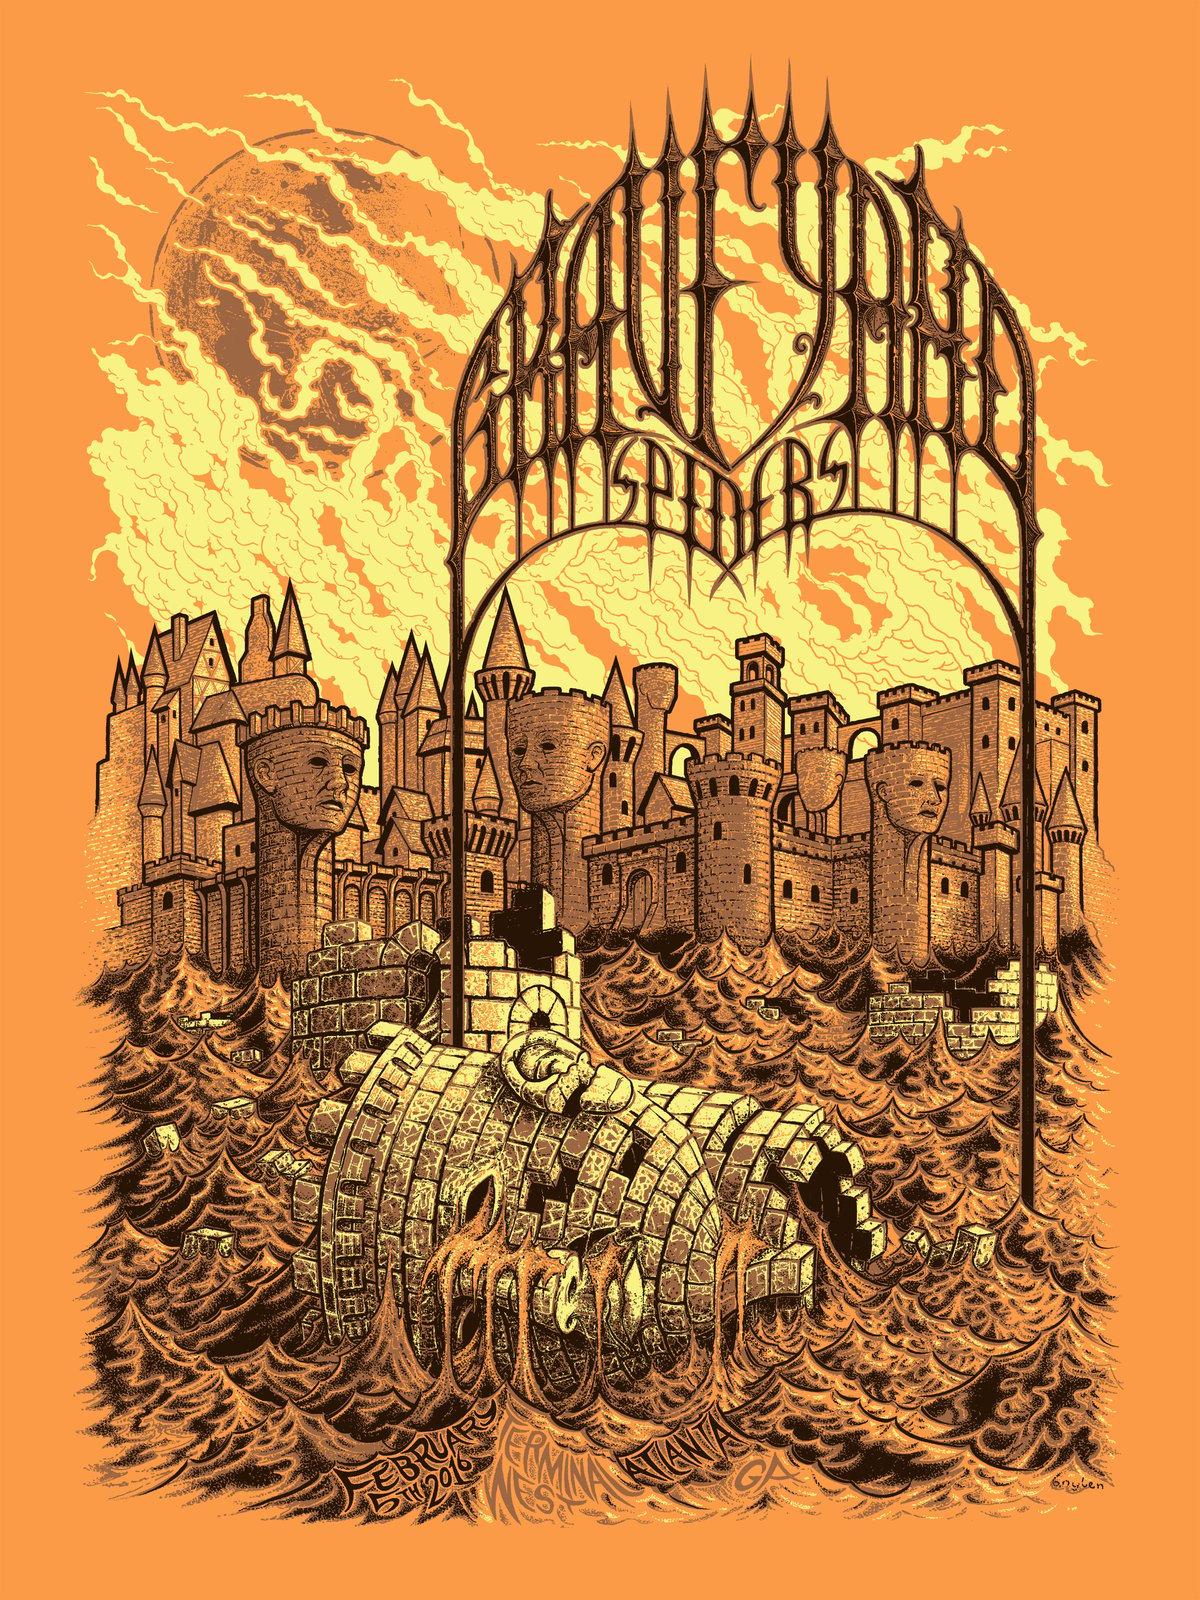 Image of Graveyard, Spiders, Terminal West, Atlanta, GA, 2/05/16